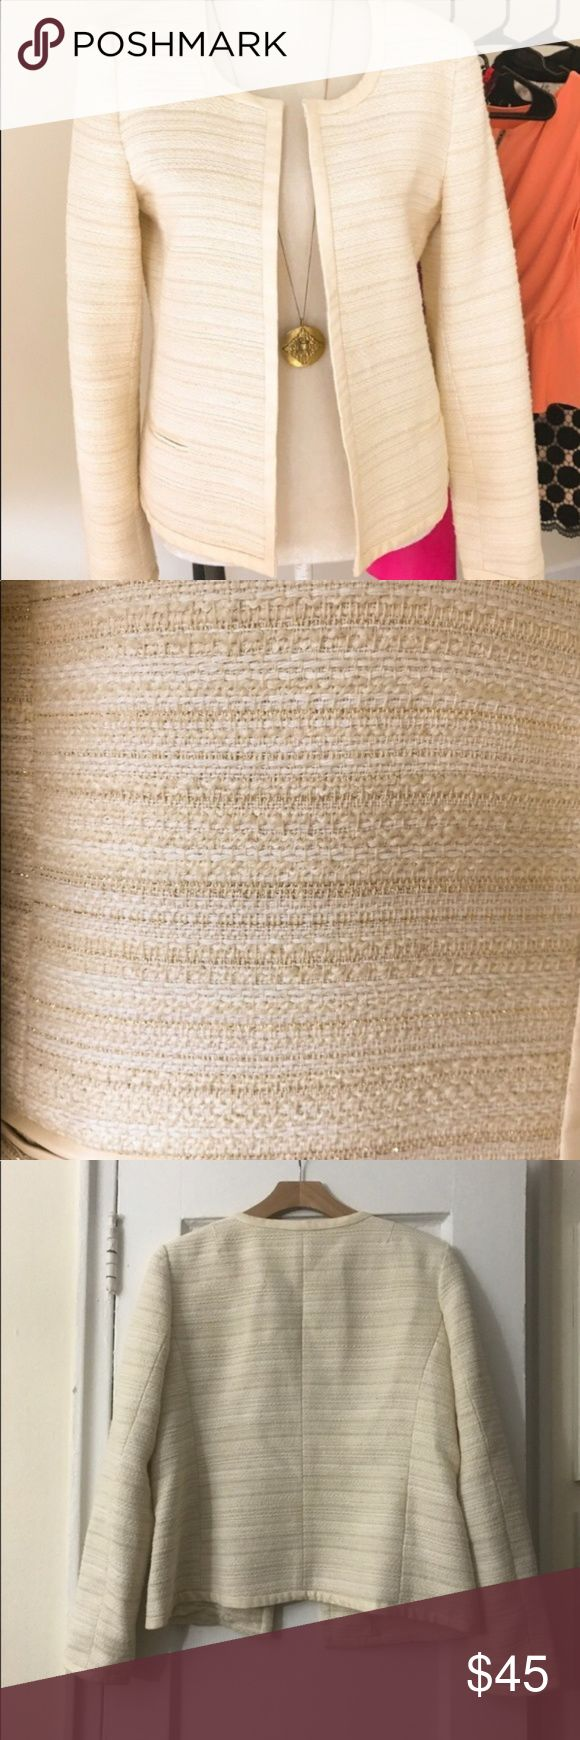 Banana Republic Metallic Tweed Open Jacket Gorgeous Metallic Tweed Open Front Jacket in perfect condition! No signs of wear. Cream, tan and metallic gold tweed with cream faux leather trim. Terrific winter white! Banana Republic Jackets & Coats Blazers